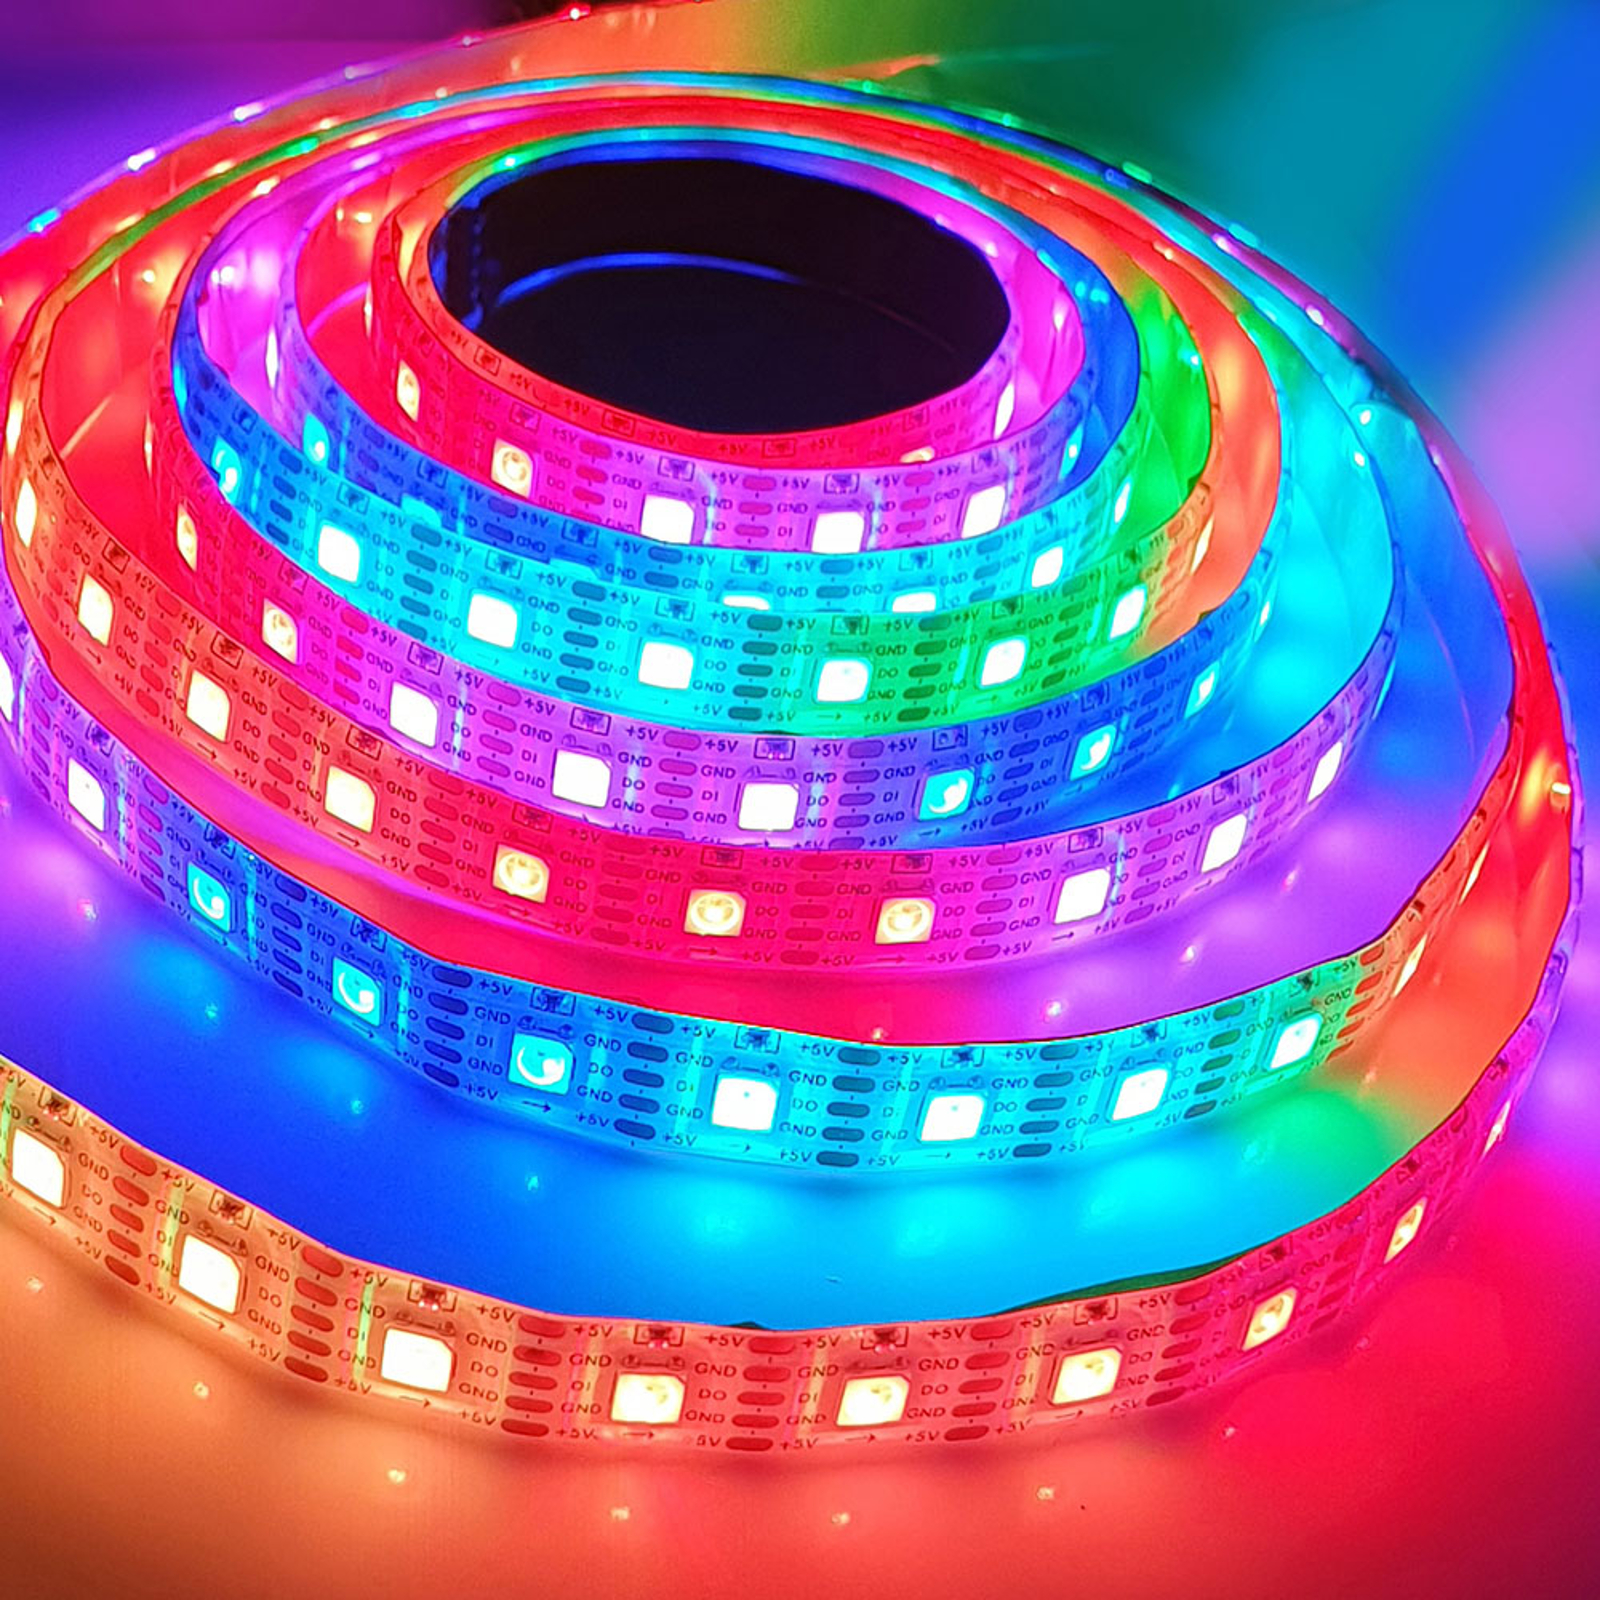 Cololight Strip utvidgning, 30 LED per meter